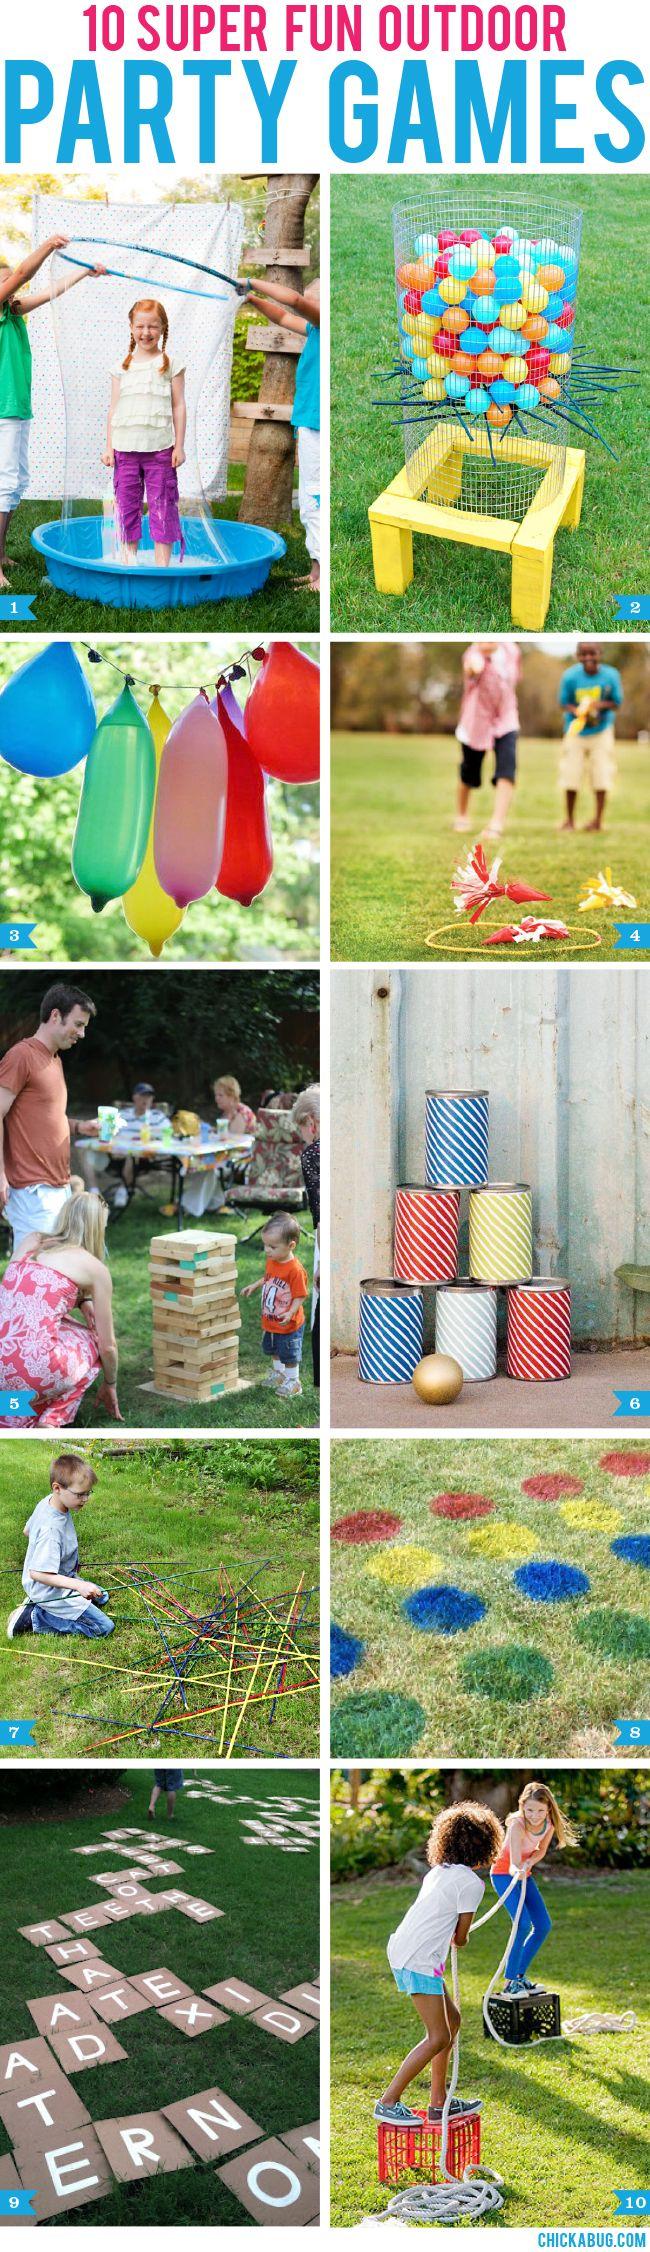 10 super fun outdoor party games